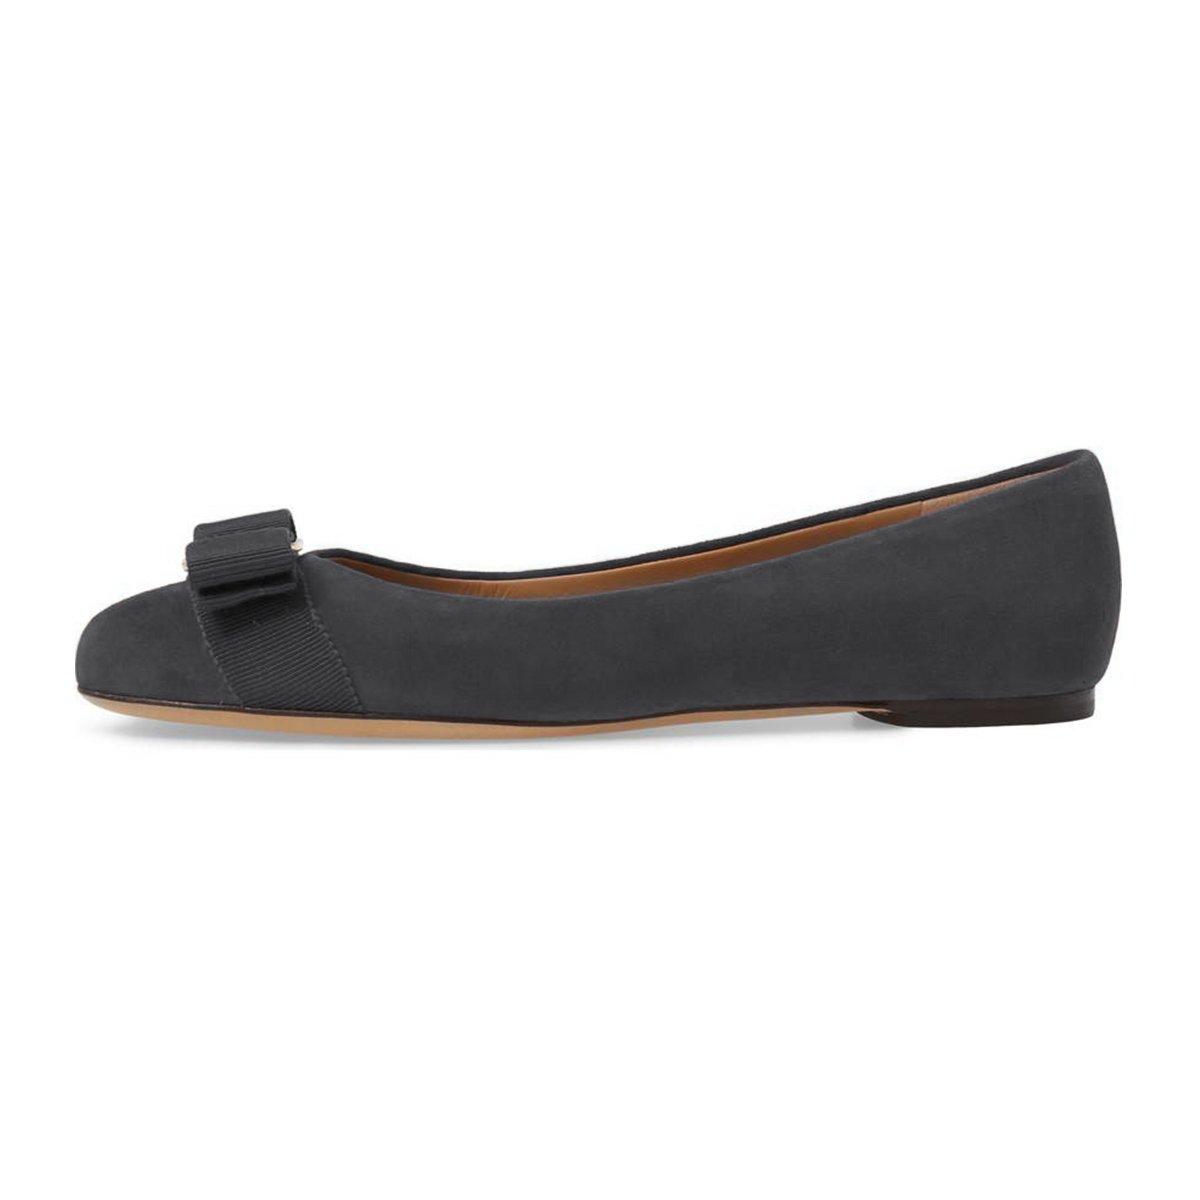 FSJ Women Cute Bowknot Round Toe Casual Ballet Flats Slip On Casual Toe Office Comfy Pumps Shoes Size 4-15 US B077P3HRK1 4 B(M) US|Dim Gray 35a56b